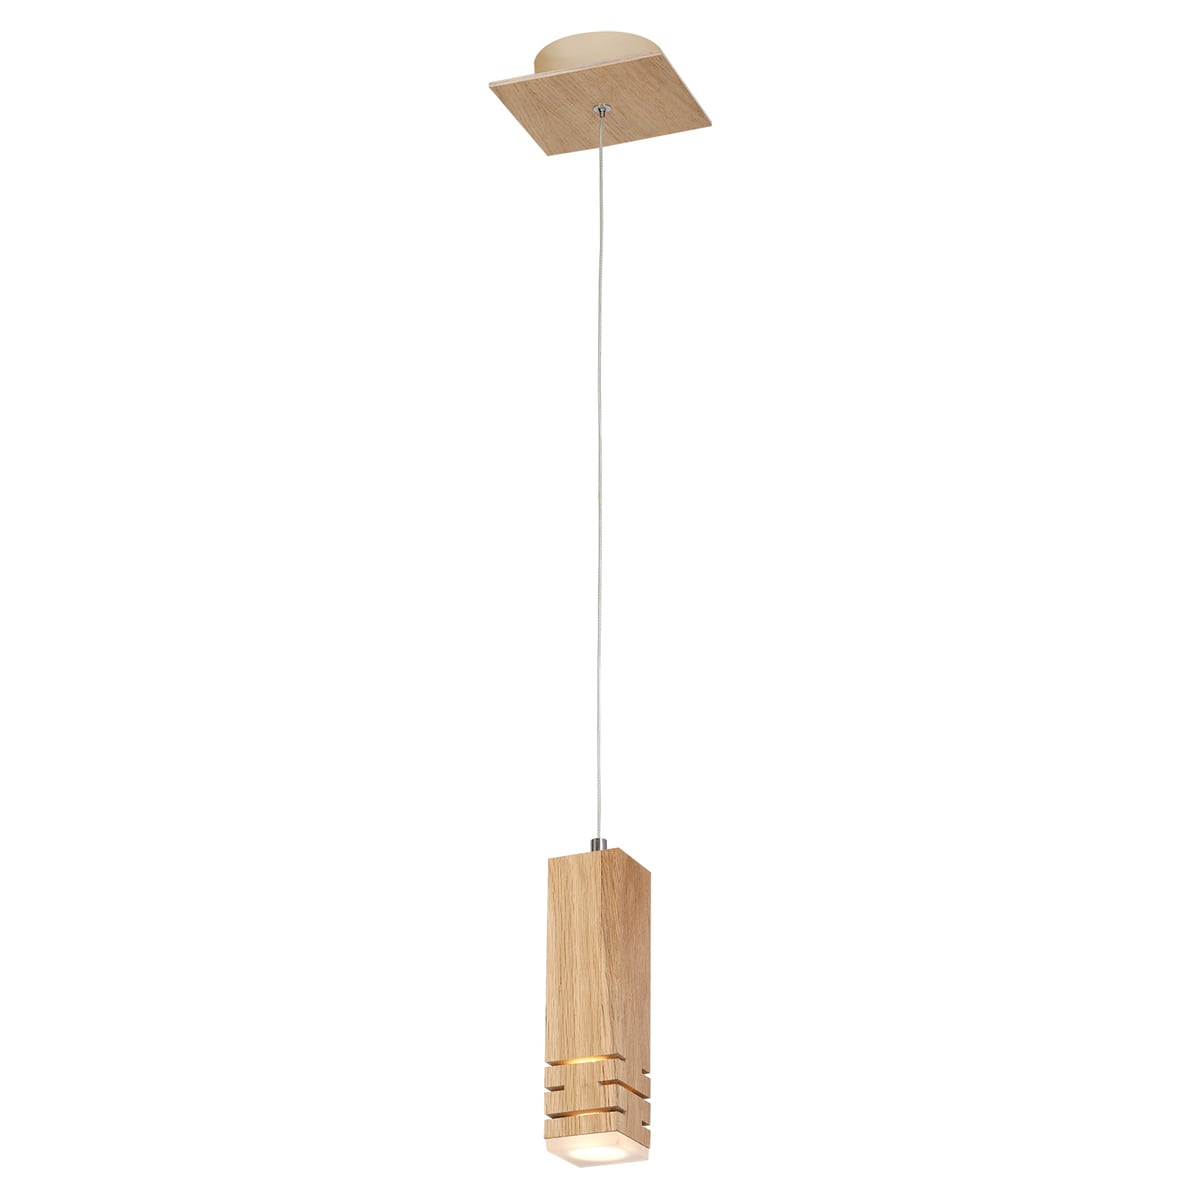 Lampa suspendată Milagro BERGEN 574 Lemn natural 5W